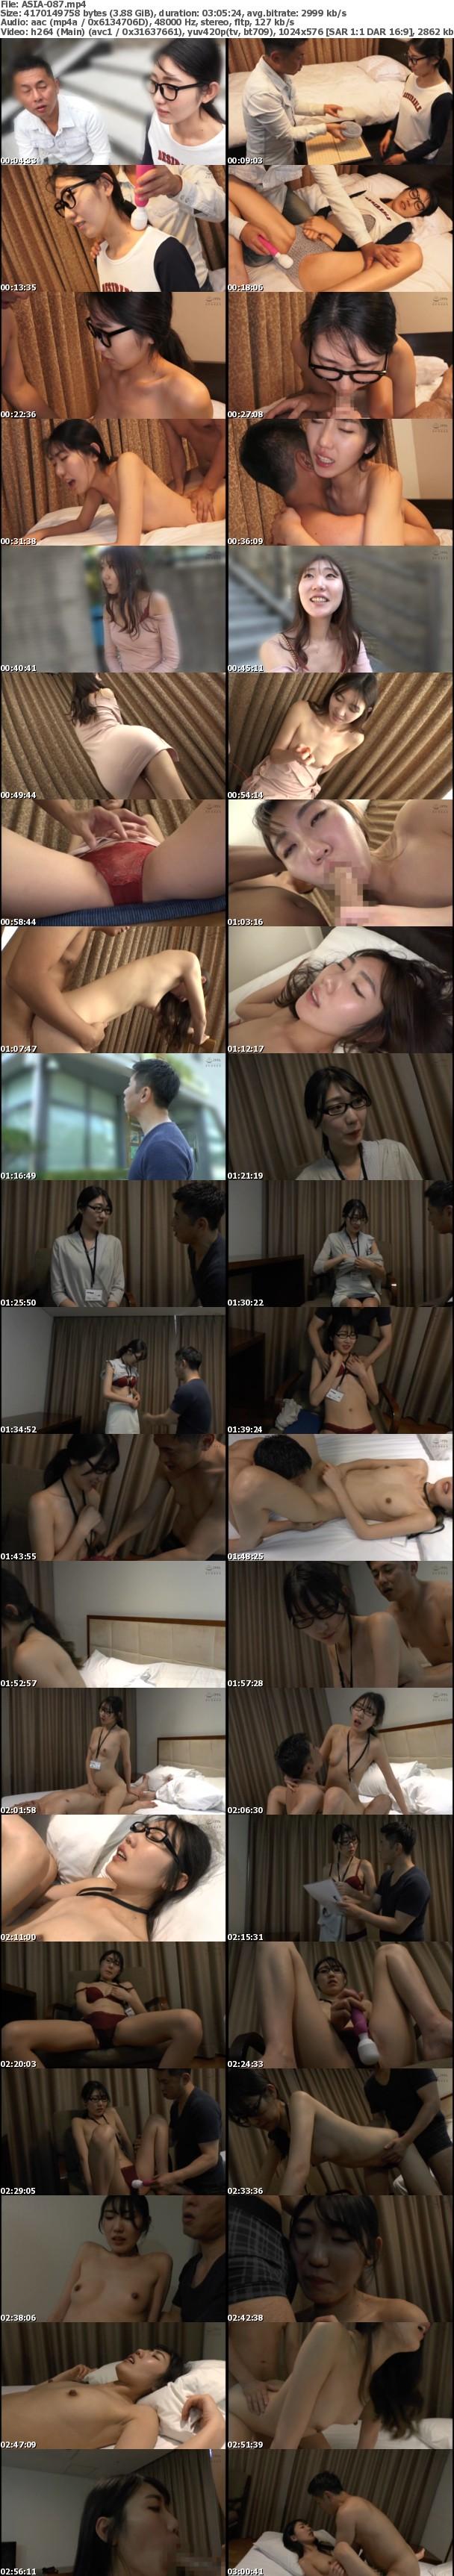 (SD) ASIA-087 ハイレベル過ぎる!韓流スレンダー美女セーヒ!圧倒的美脚を見せつけ日本男児と密着セックス!